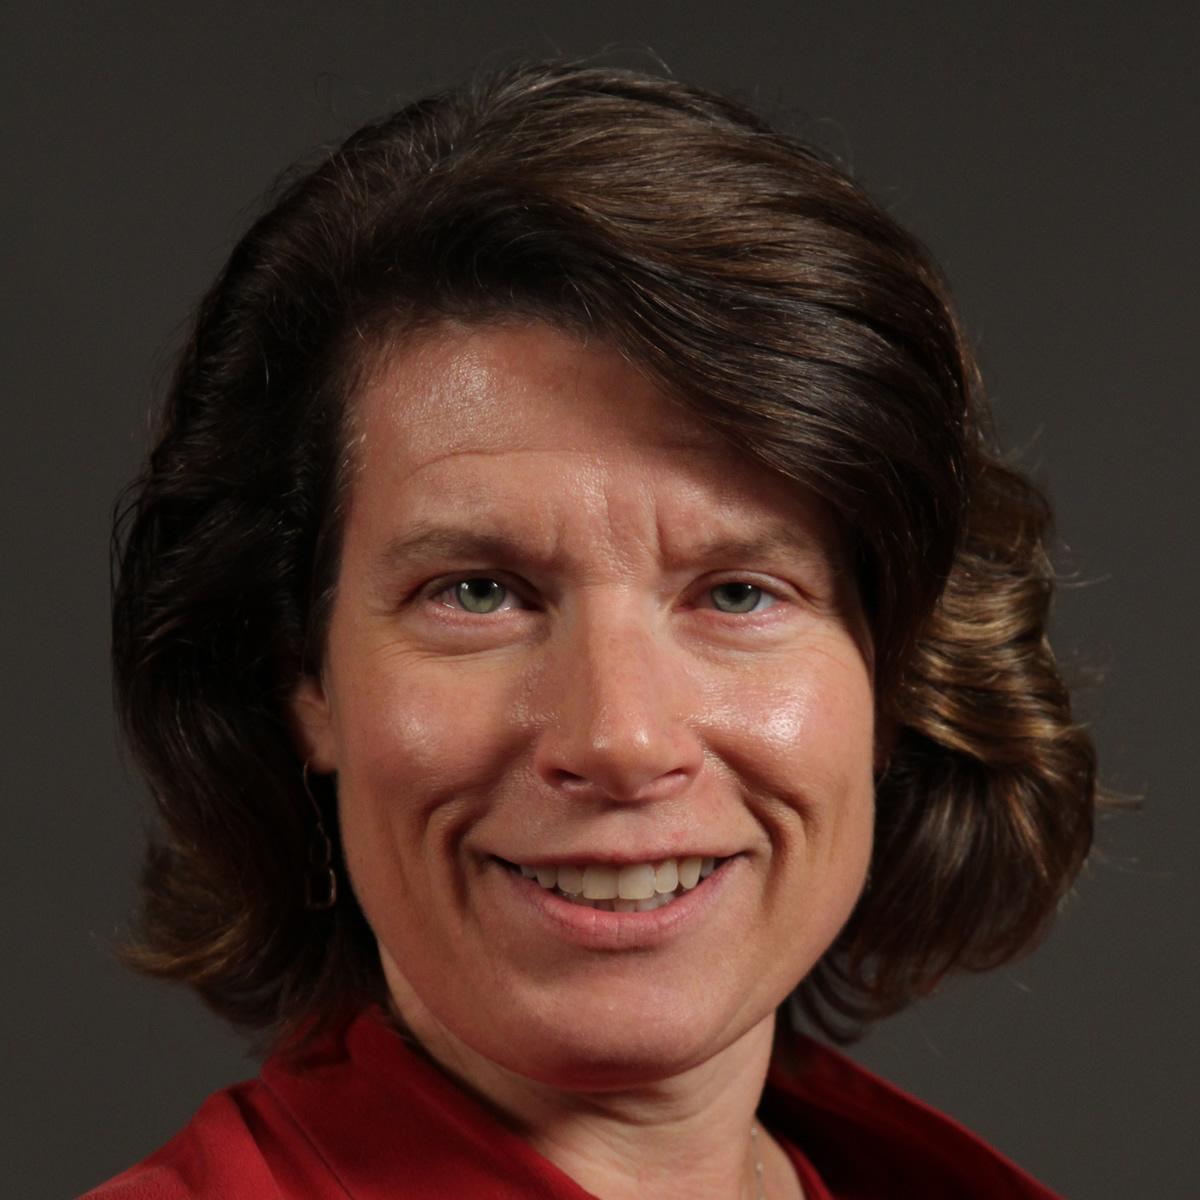 Linda Kurtz, Senior Environmental Program Manager; Mars Wrigley Confectionery Inc.